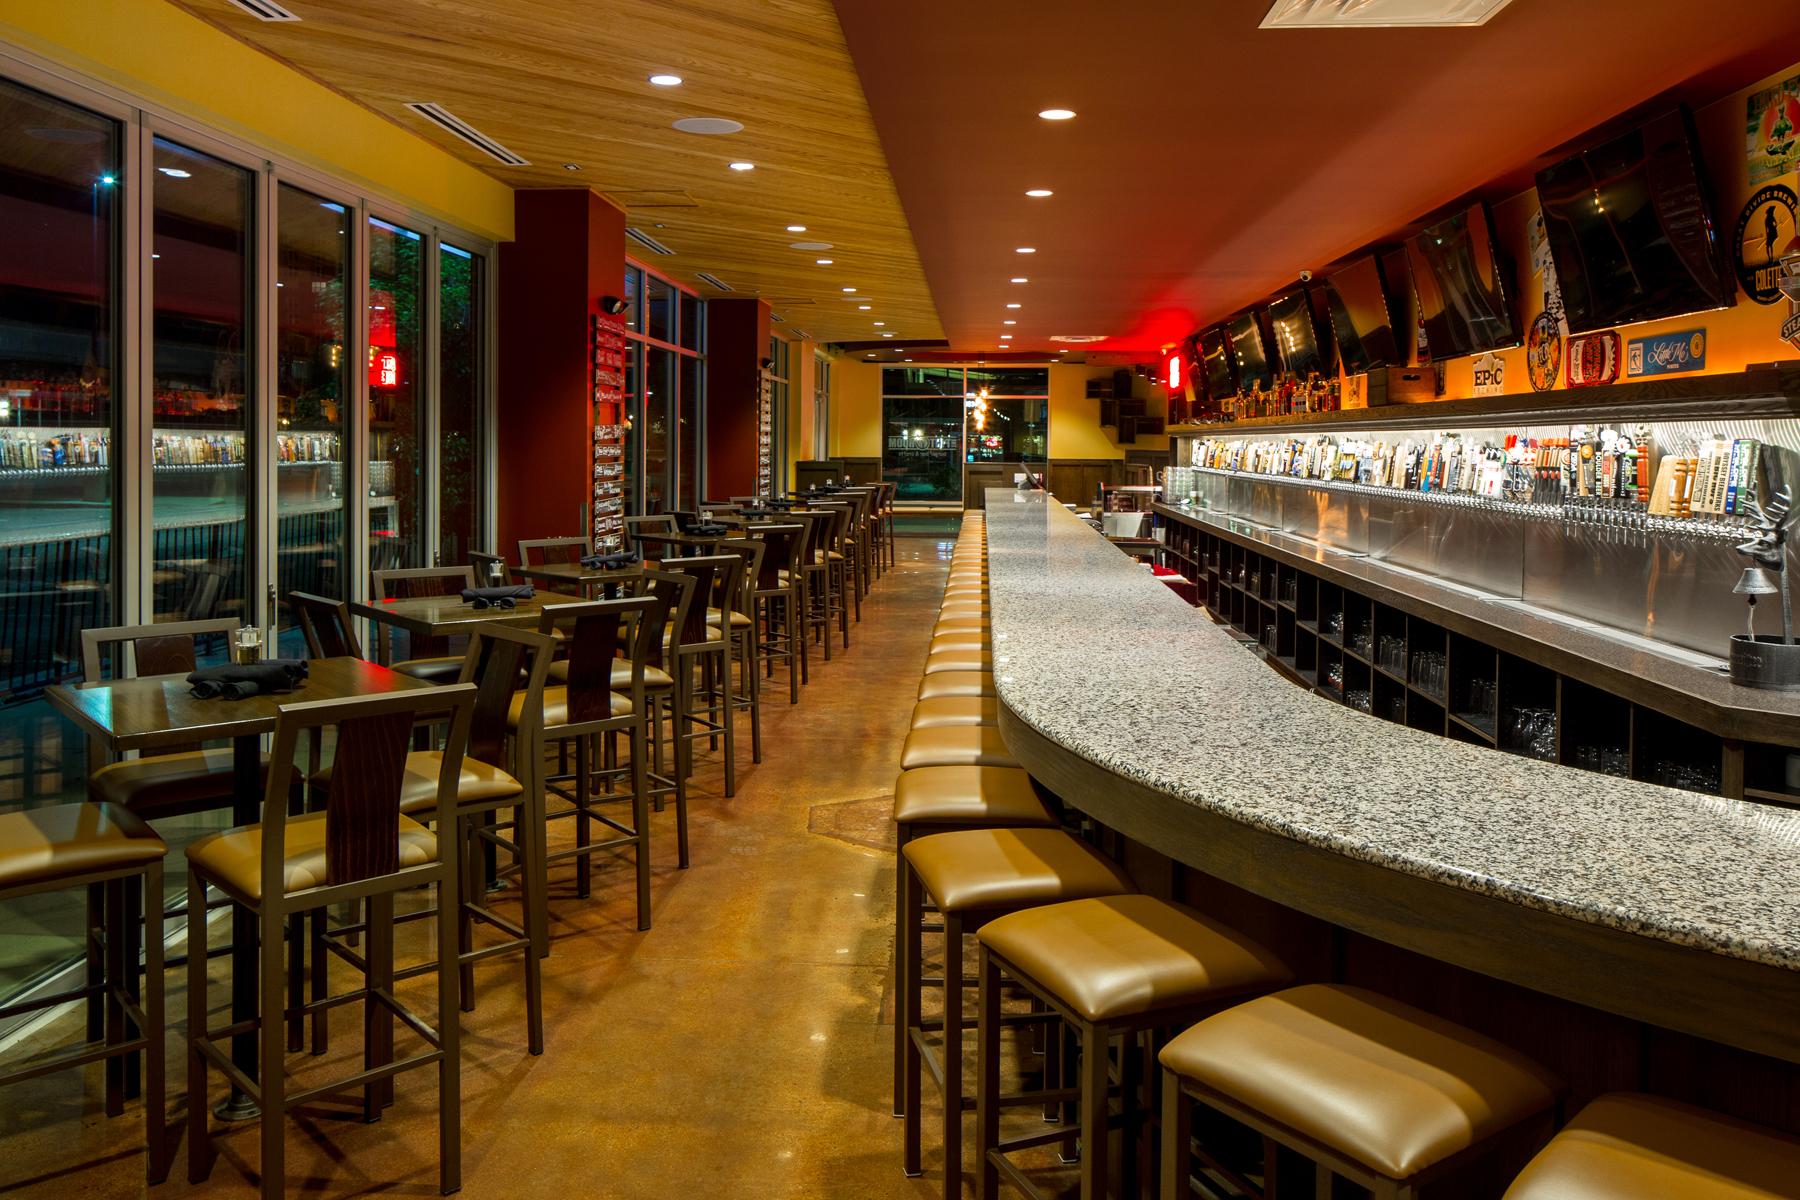 Restaurant Remodel Colorado The Pint